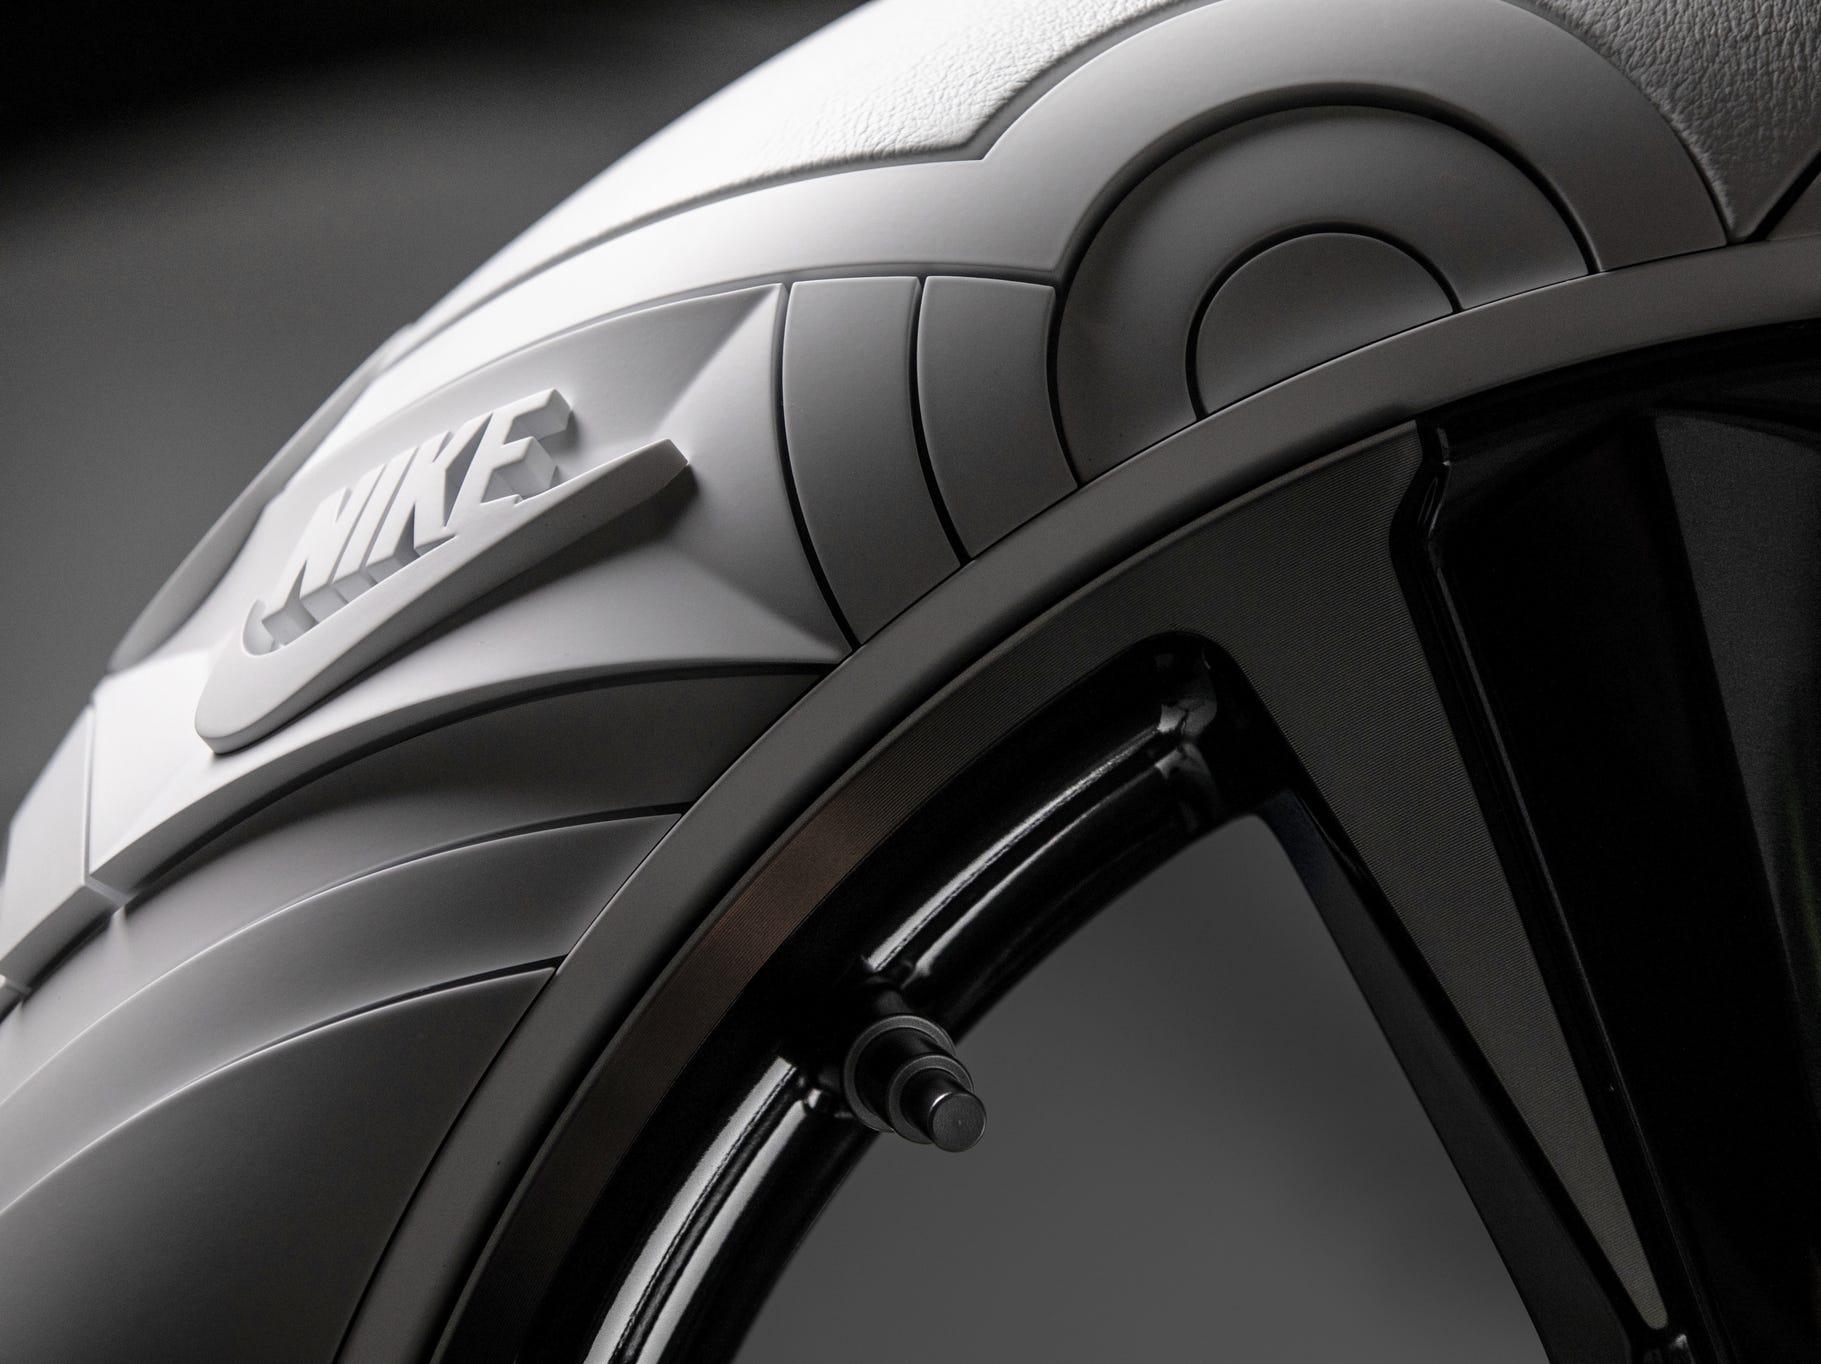 Nike Logo on Lexus UX tires